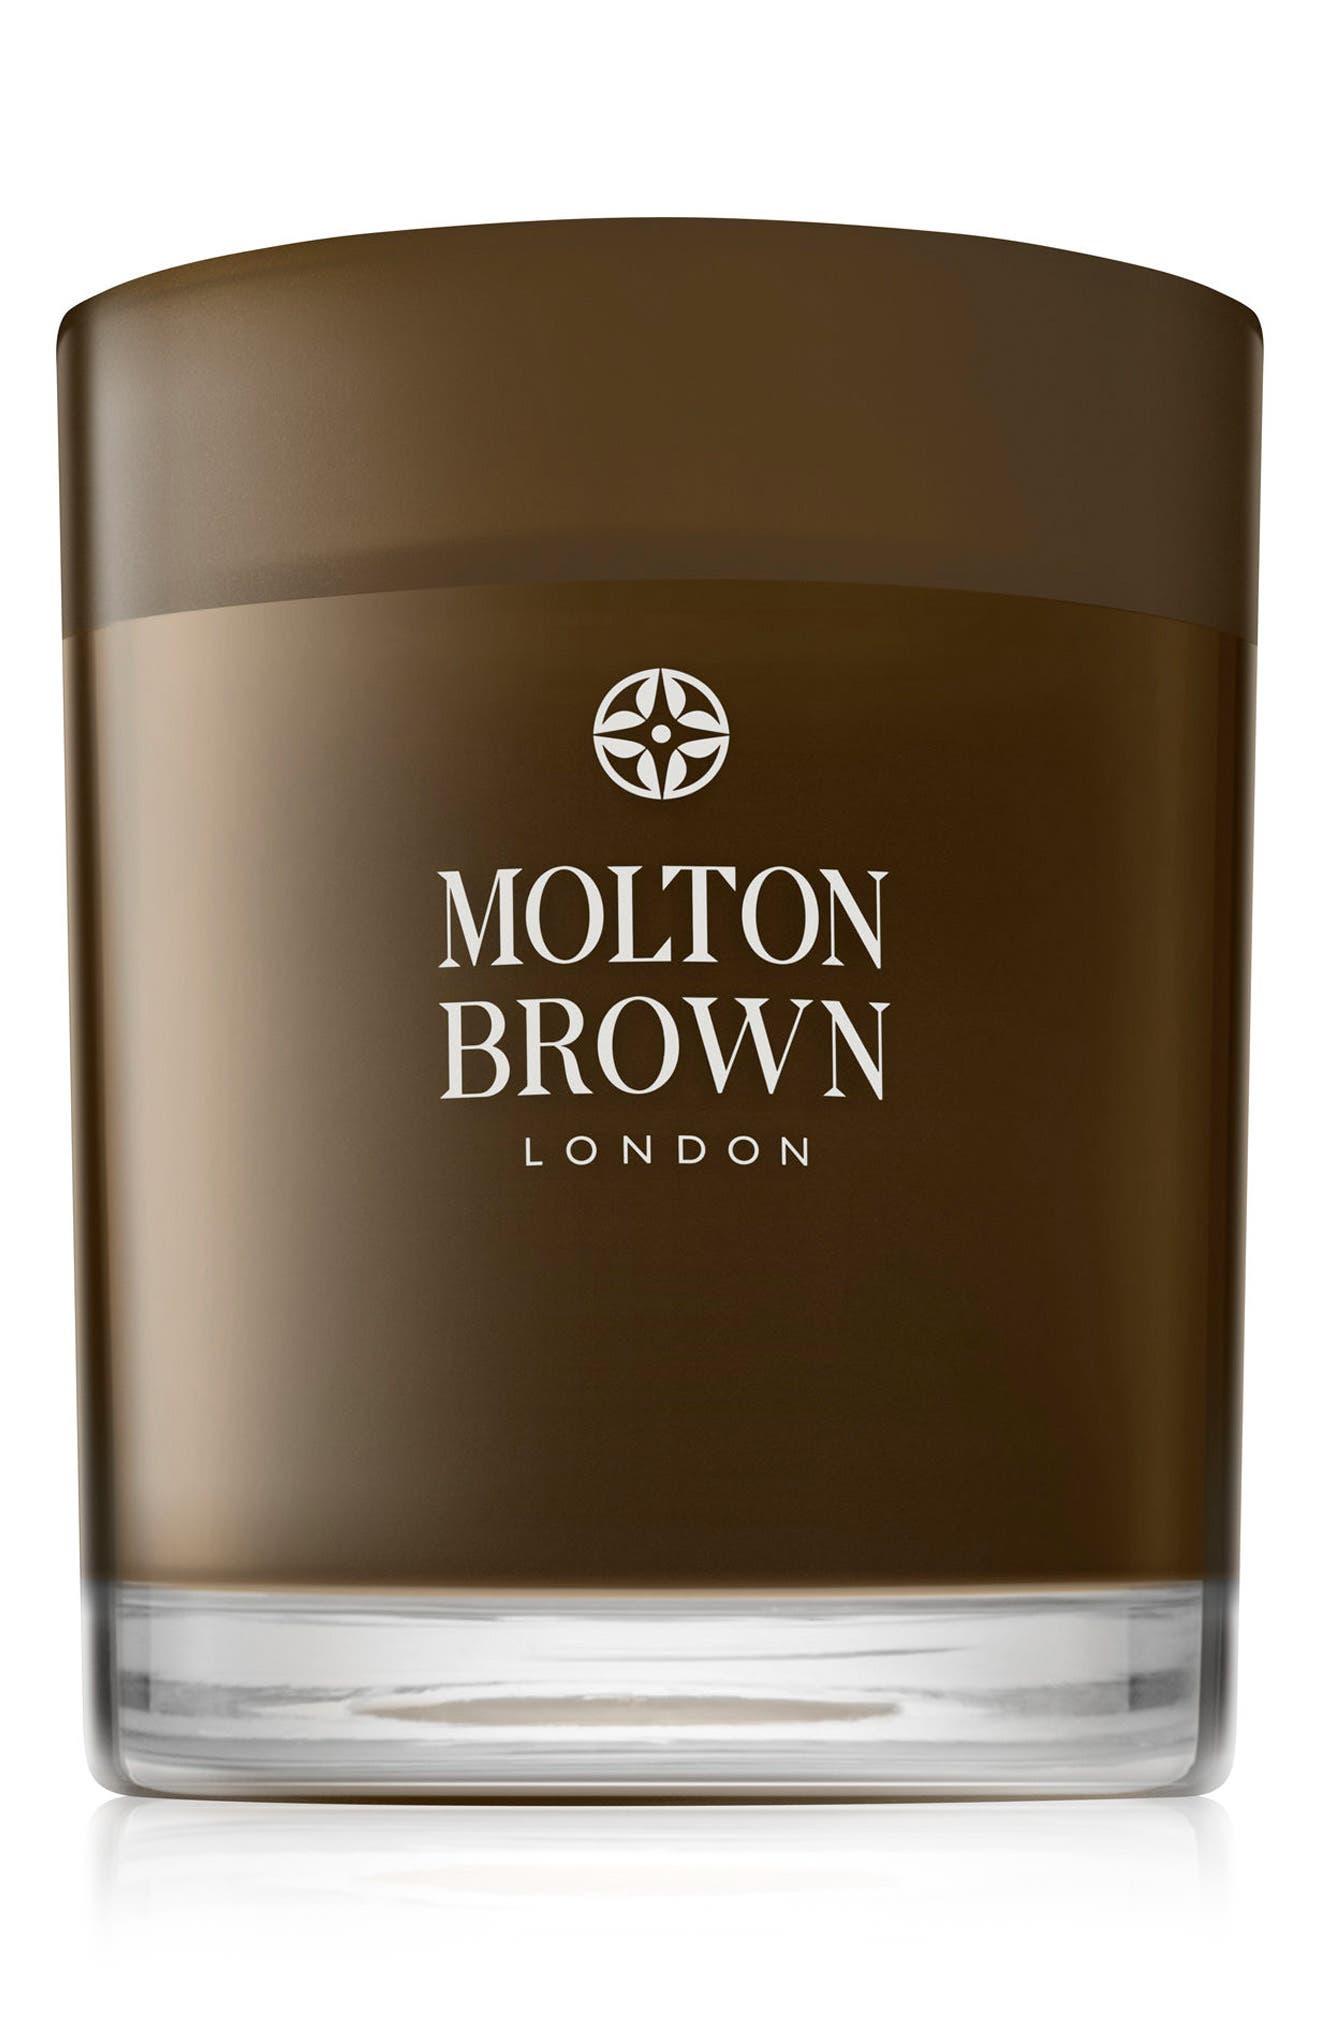 MOLTON BROWN London Single Wick Candle